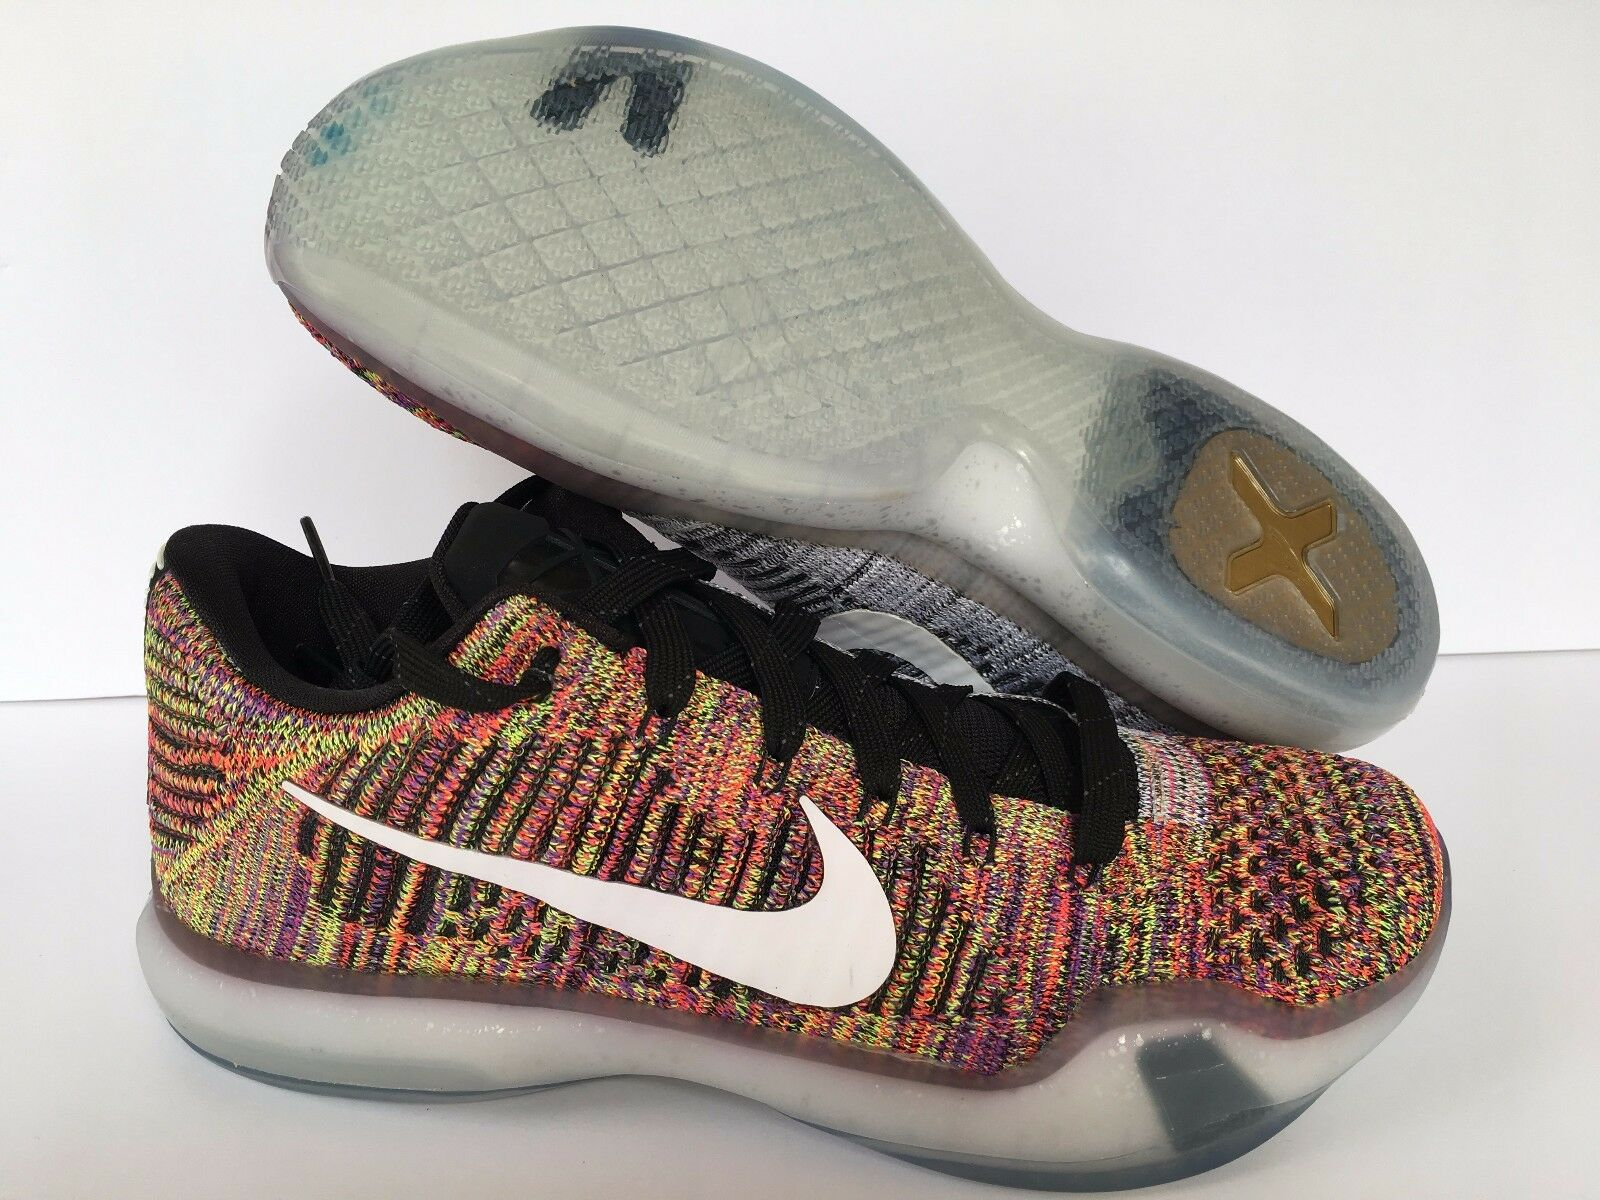 Nike Kobe X Elite Low iD Multi-Color 802817-903 Men's Sz 11 New